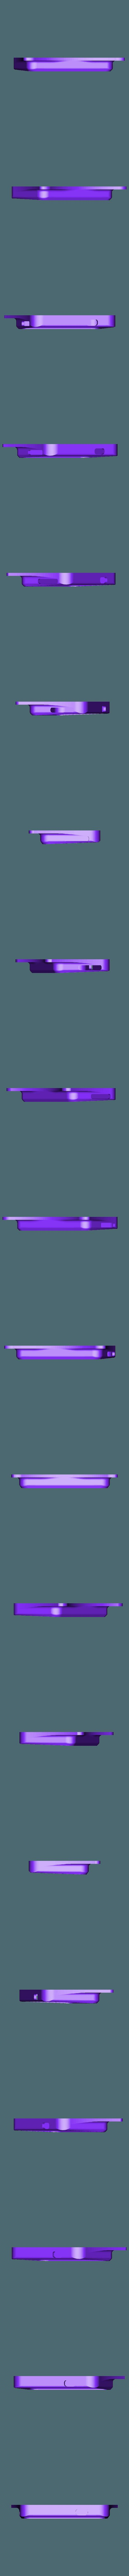 KeyBoard Holder v1 v41.stl Download STL file Arduino RaspBerry Pi Rasbian On Site Programmer • 3D printer template, nik101968